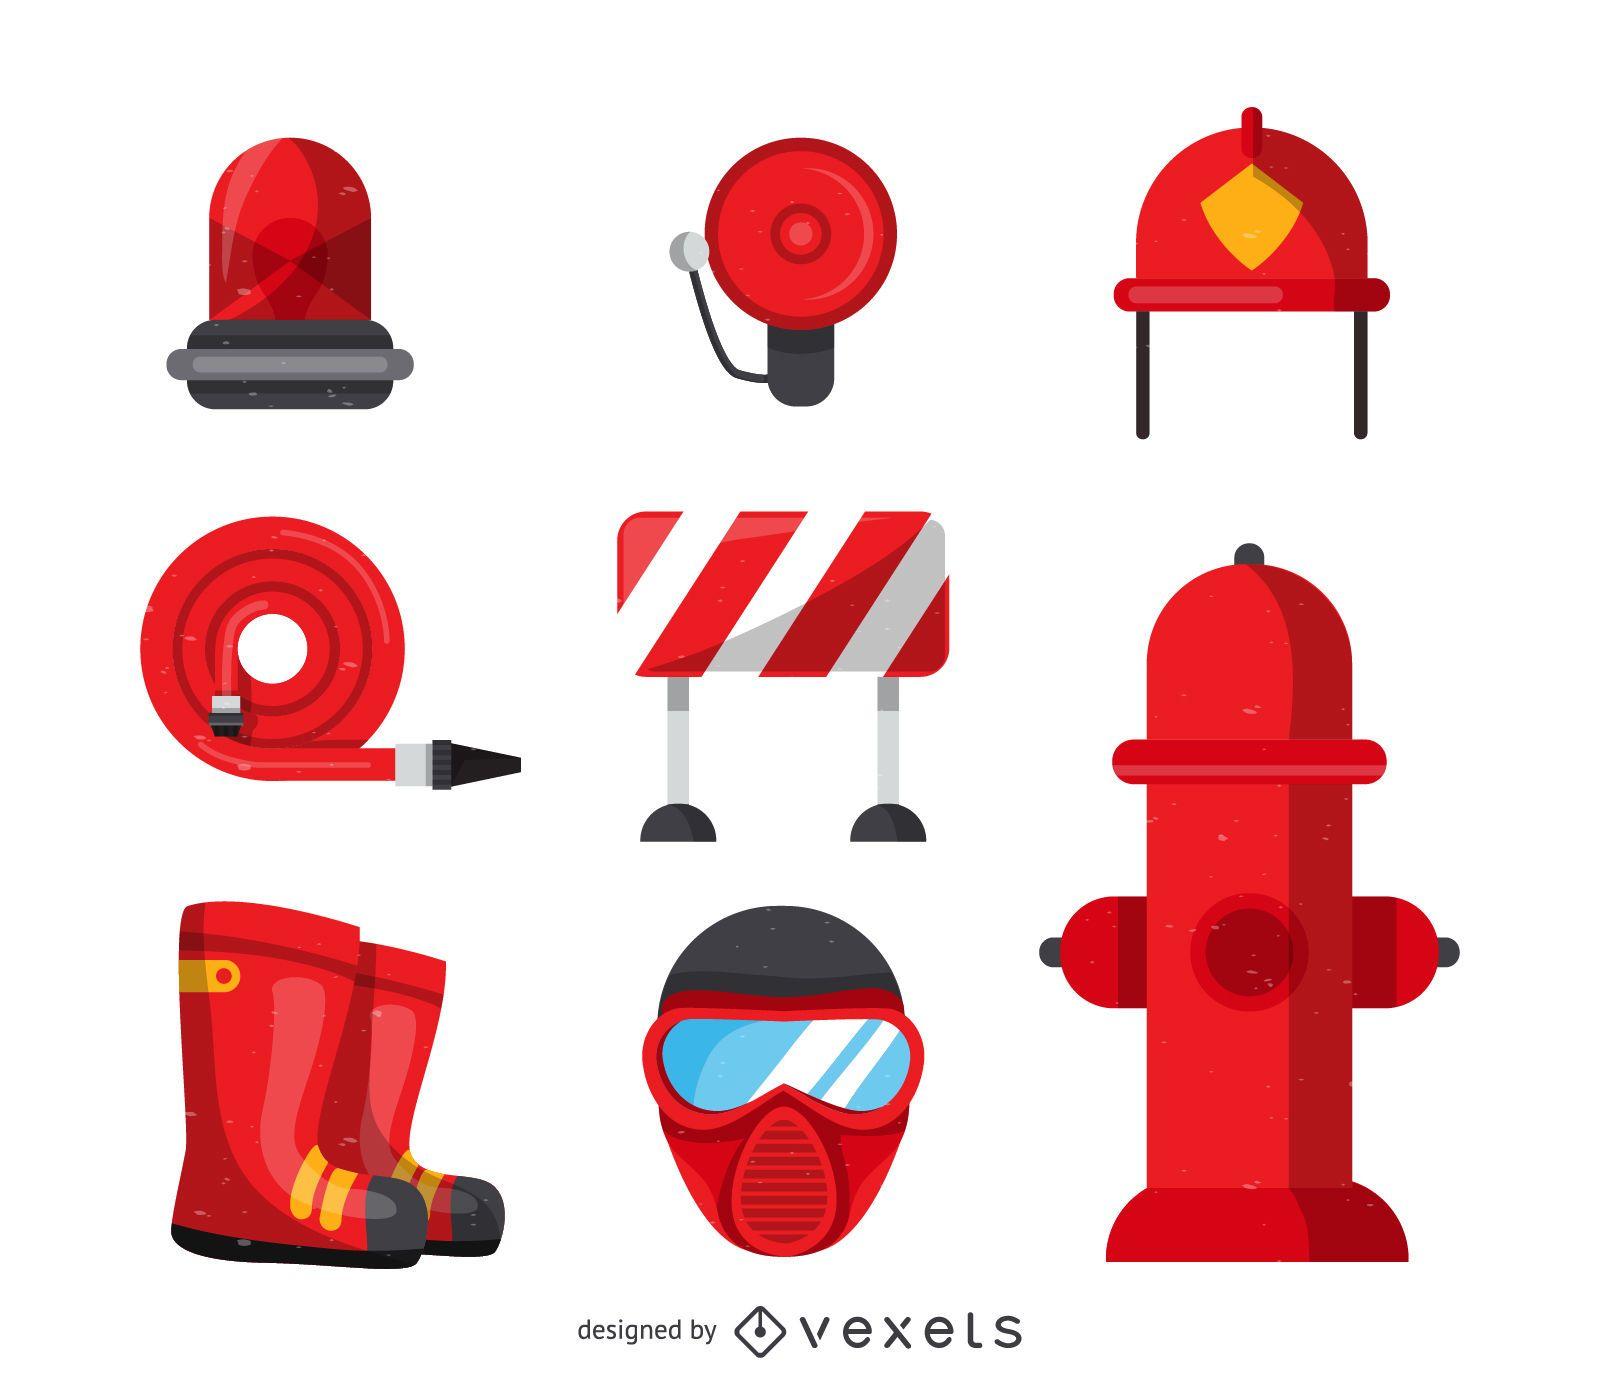 Fireman tools icons collection